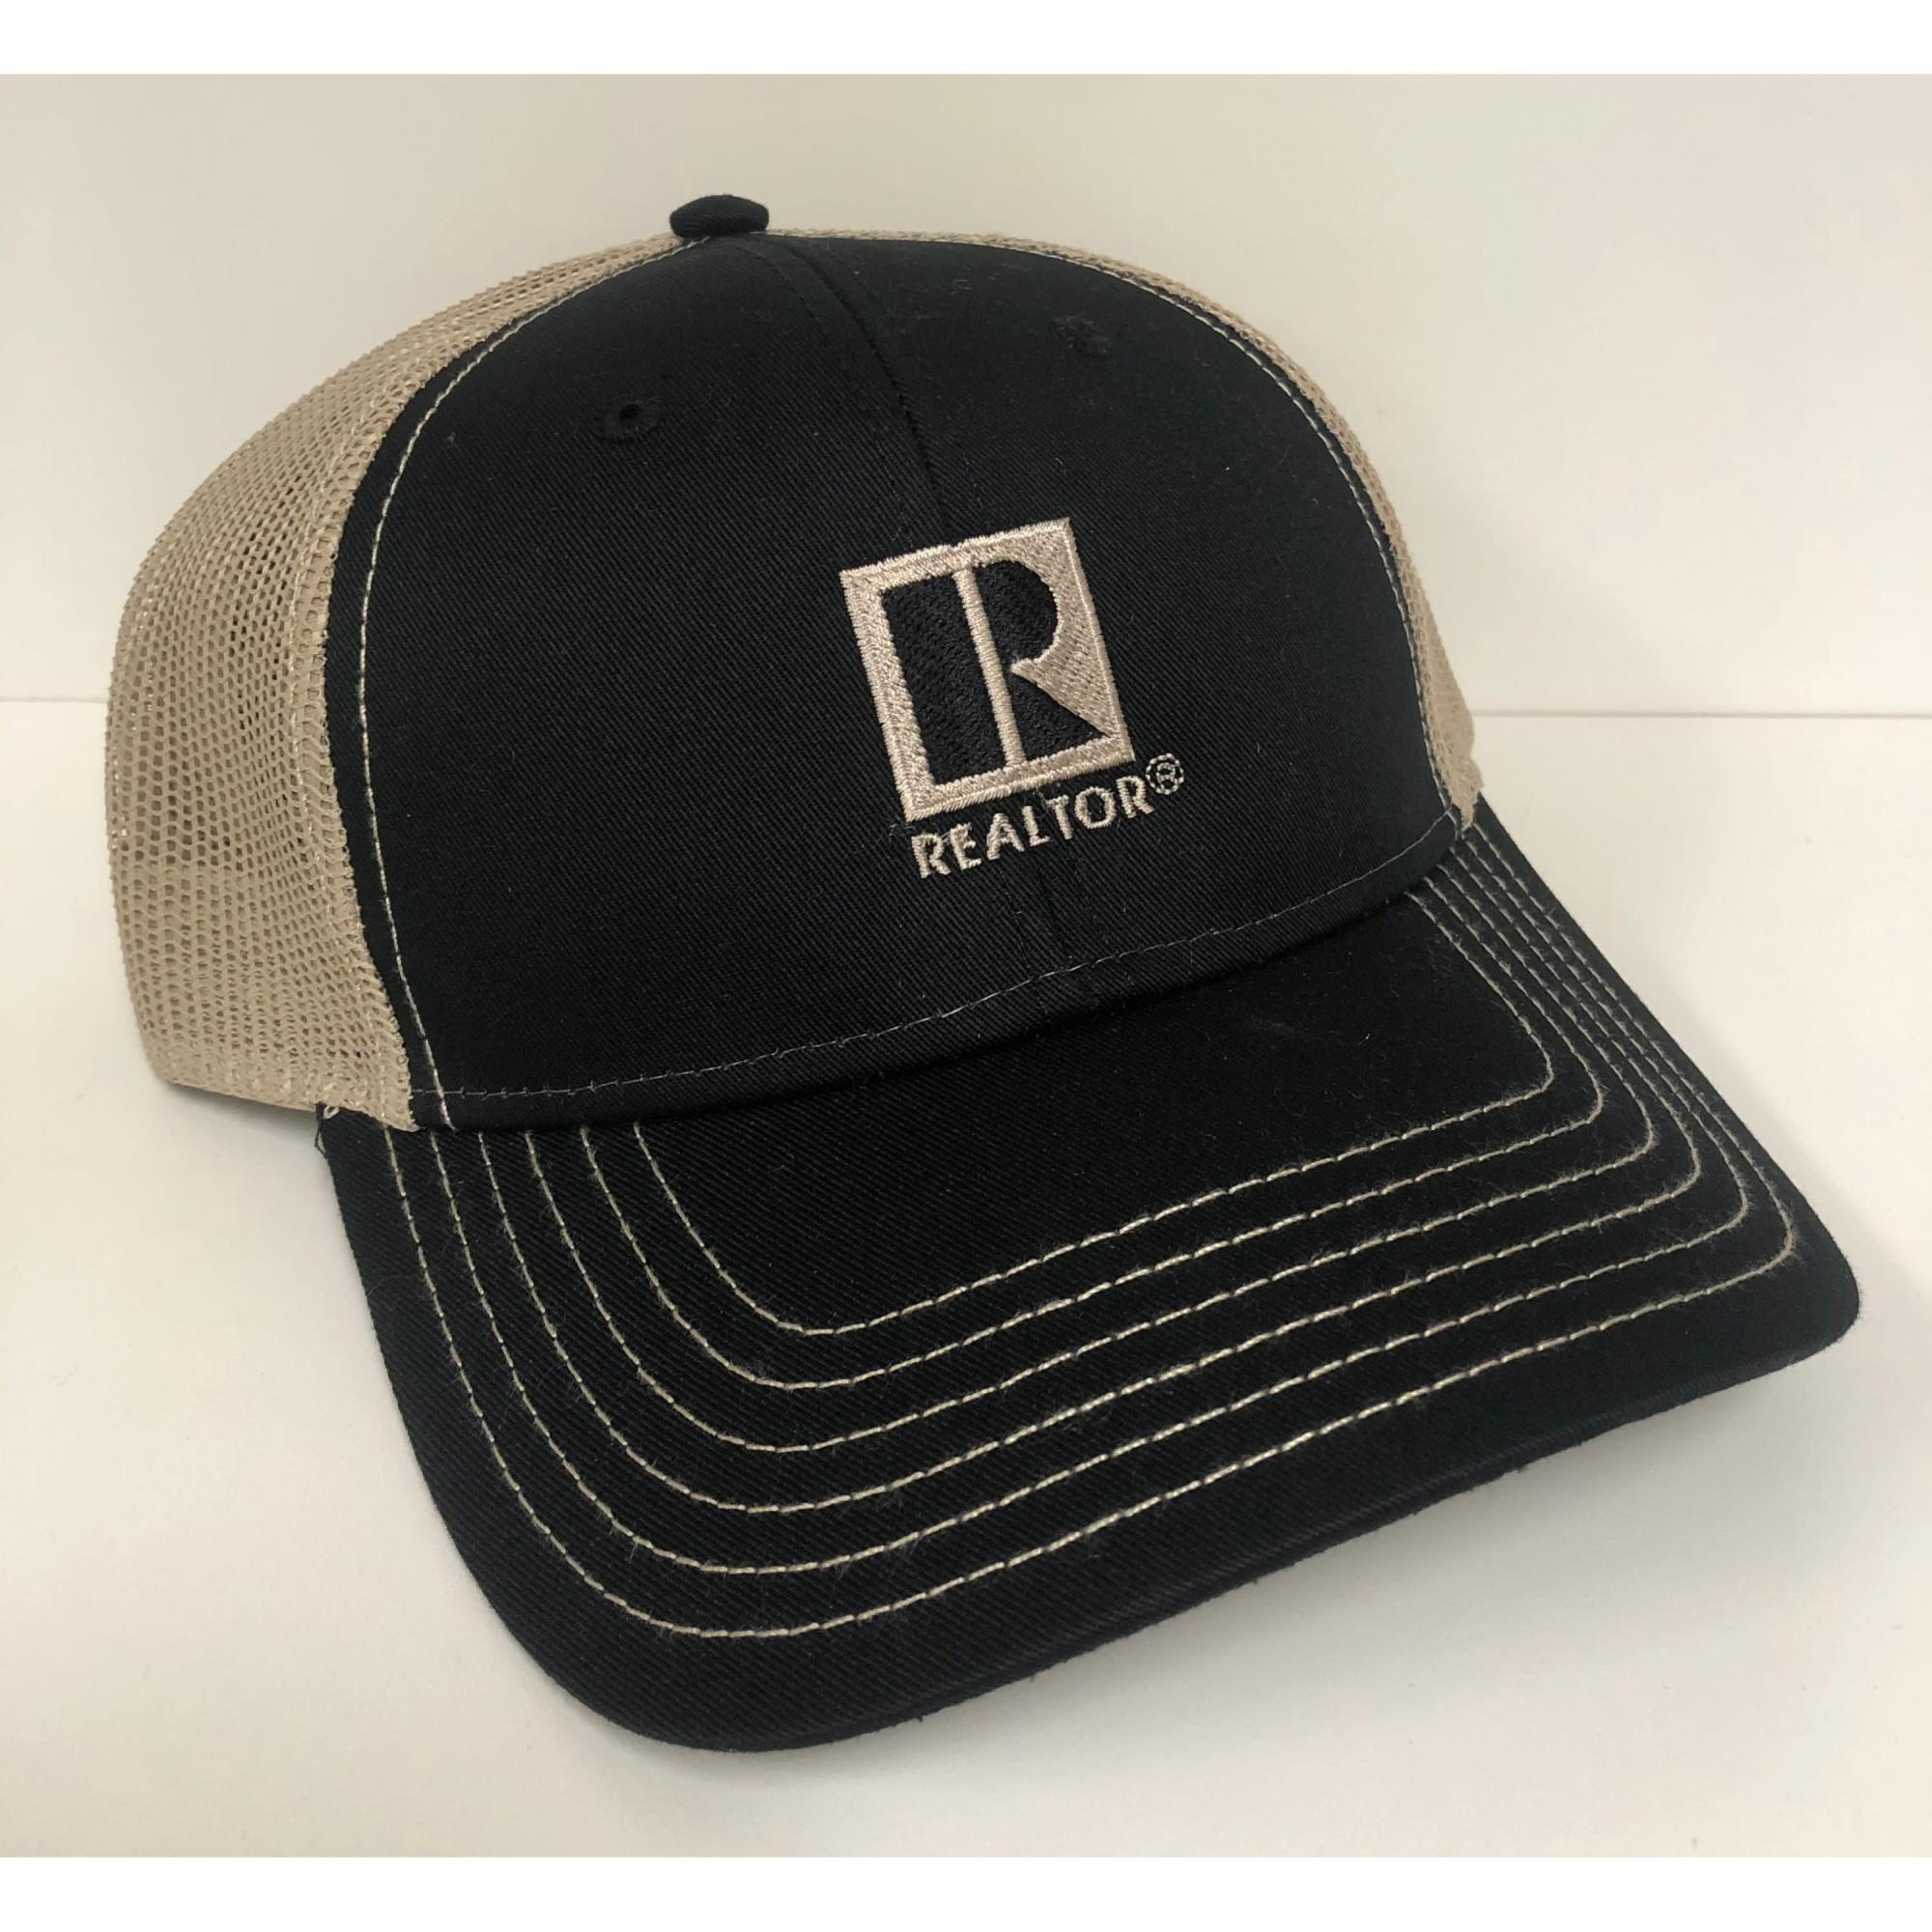 Black and Tan REALTOR® Trucker Cap provided by WCREALTORS